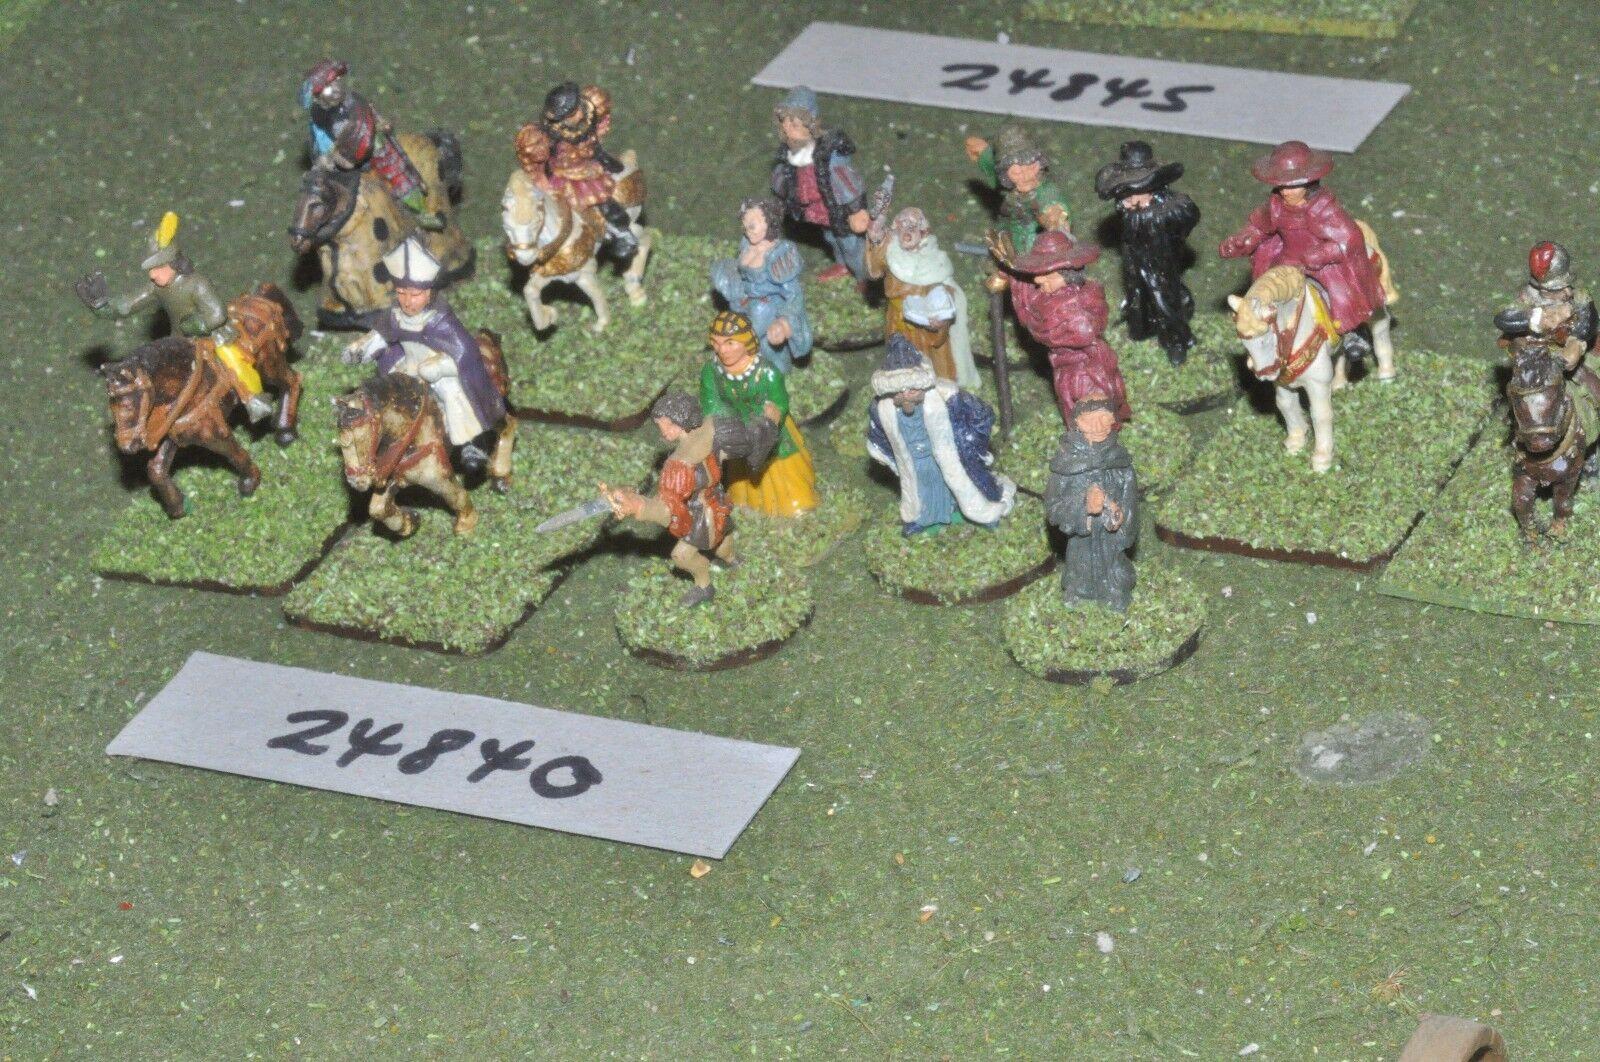 25mm renaissance   english - characters & civilians 16 figures - inf (24840)